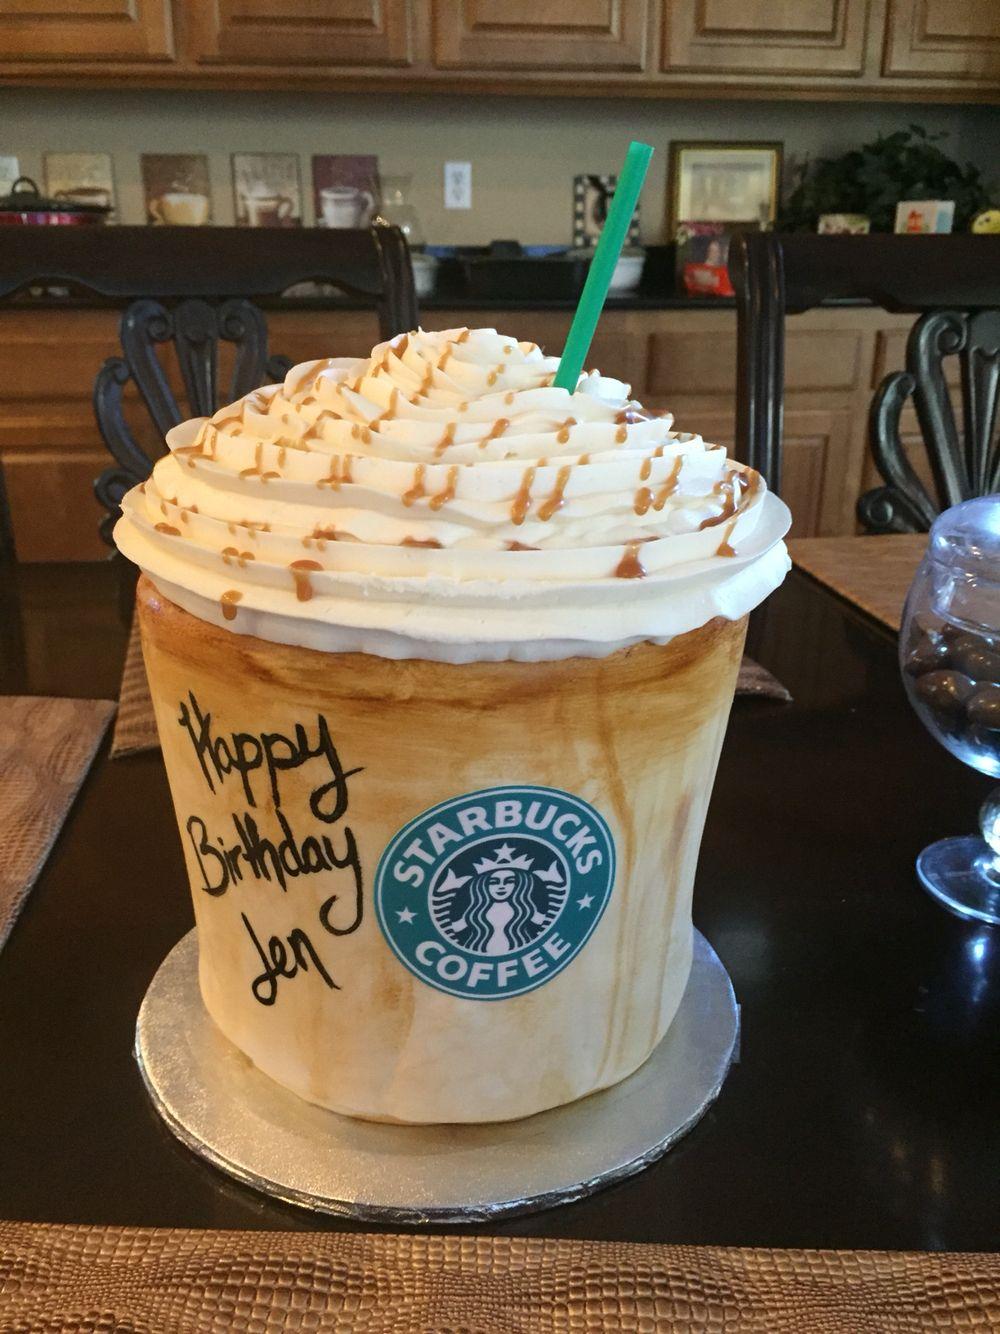 Caramel Macchiato Starbucks Starbucks Cake Birthday Cake Themed